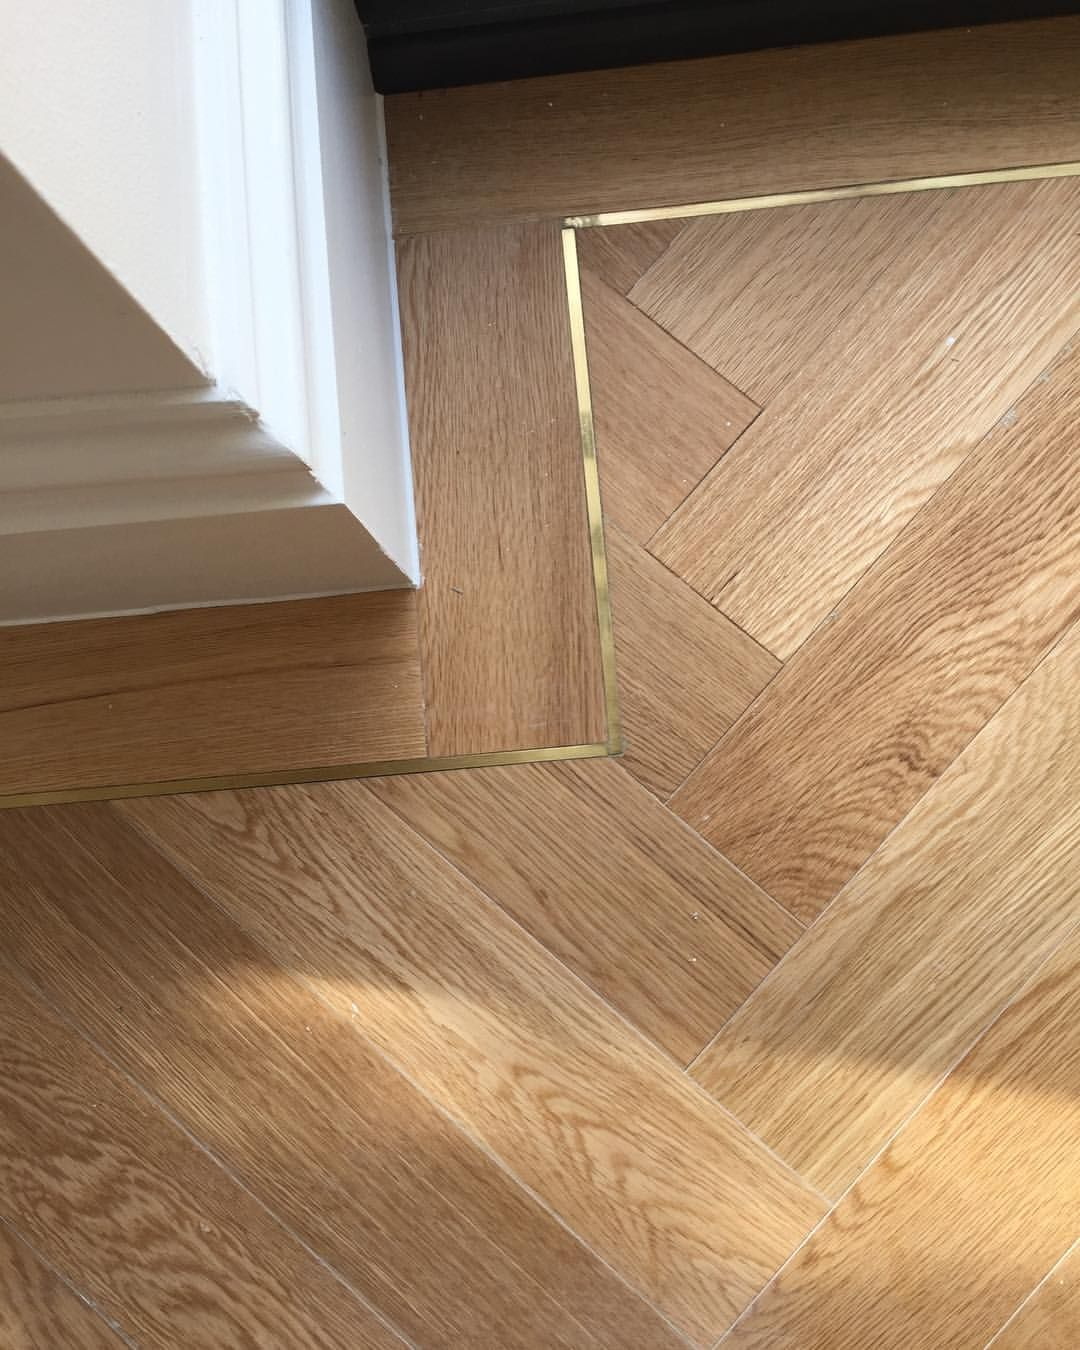 5+ Finishes & floors ideas in 5  design, floor patterns